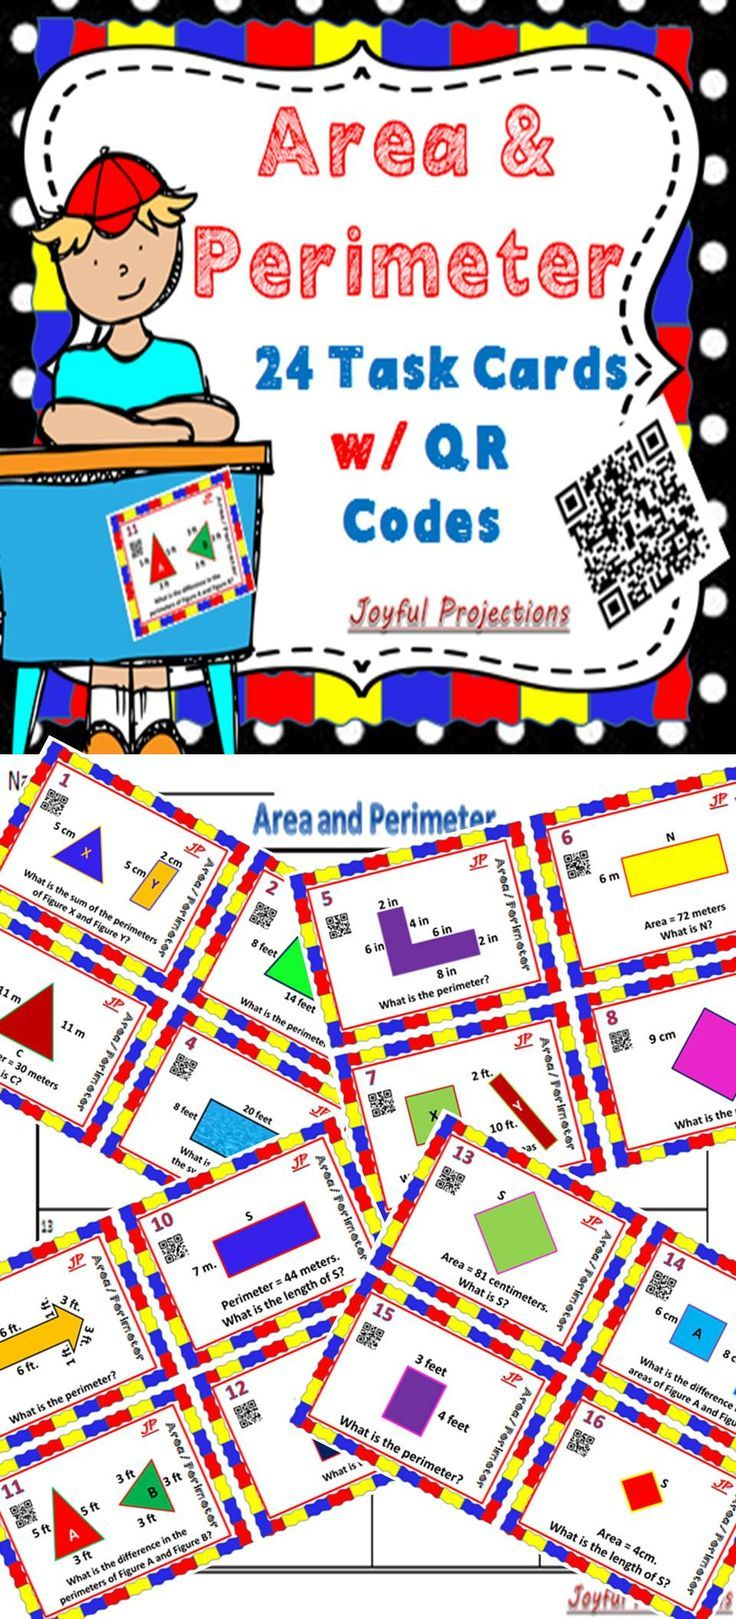 Area & Perimeterarea And Perimeter Task Cards